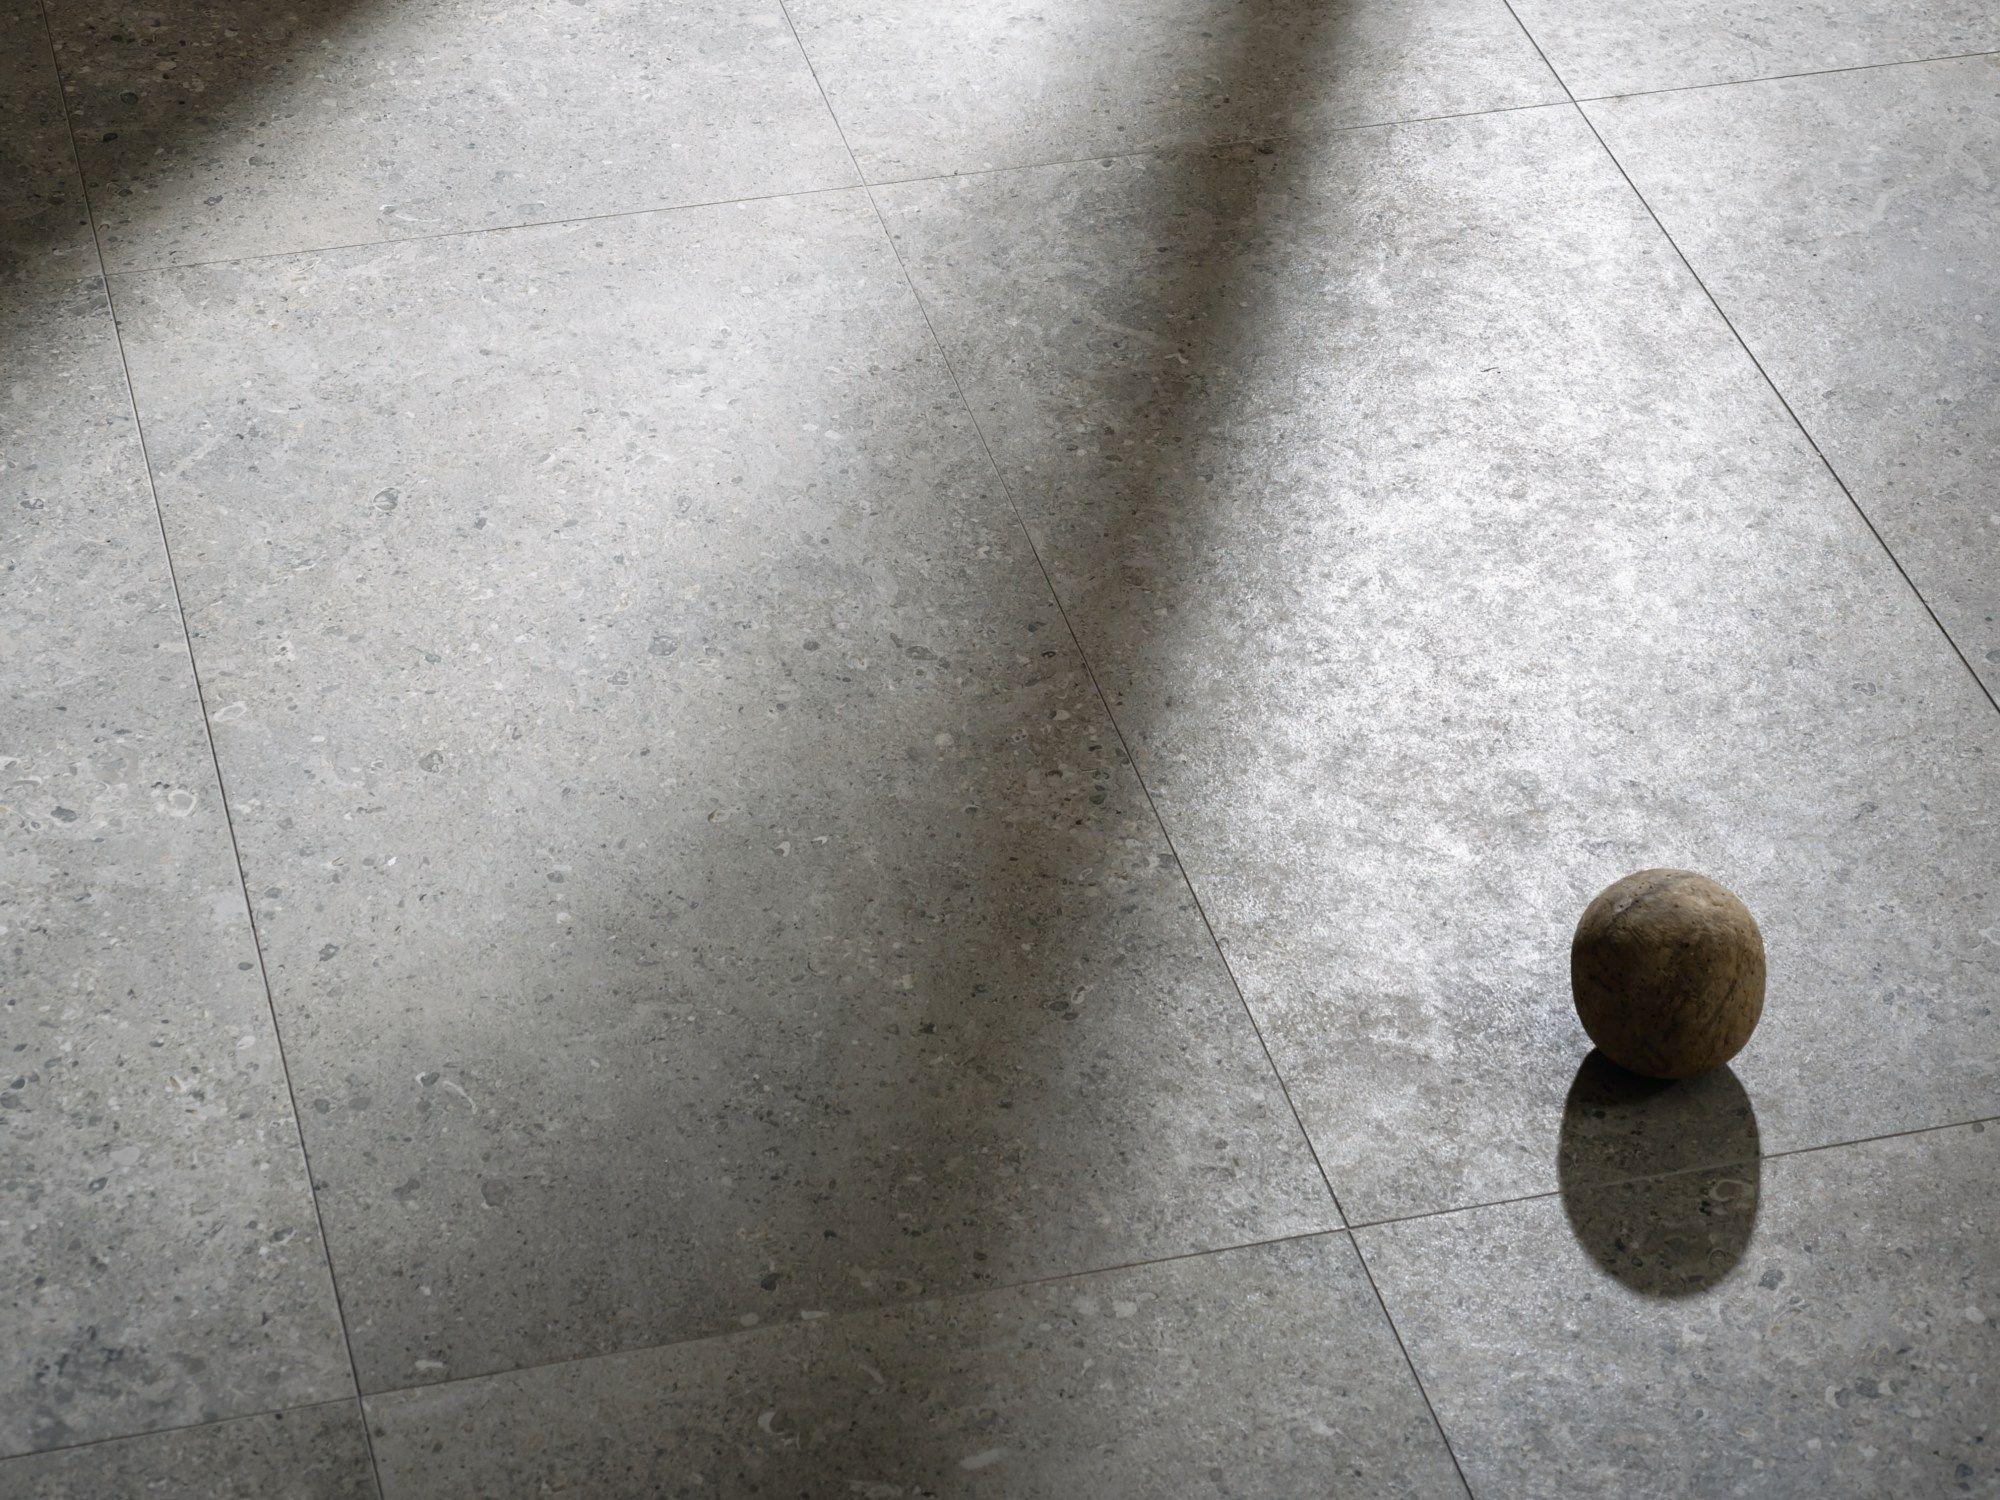 resine per pavimenti interni roma